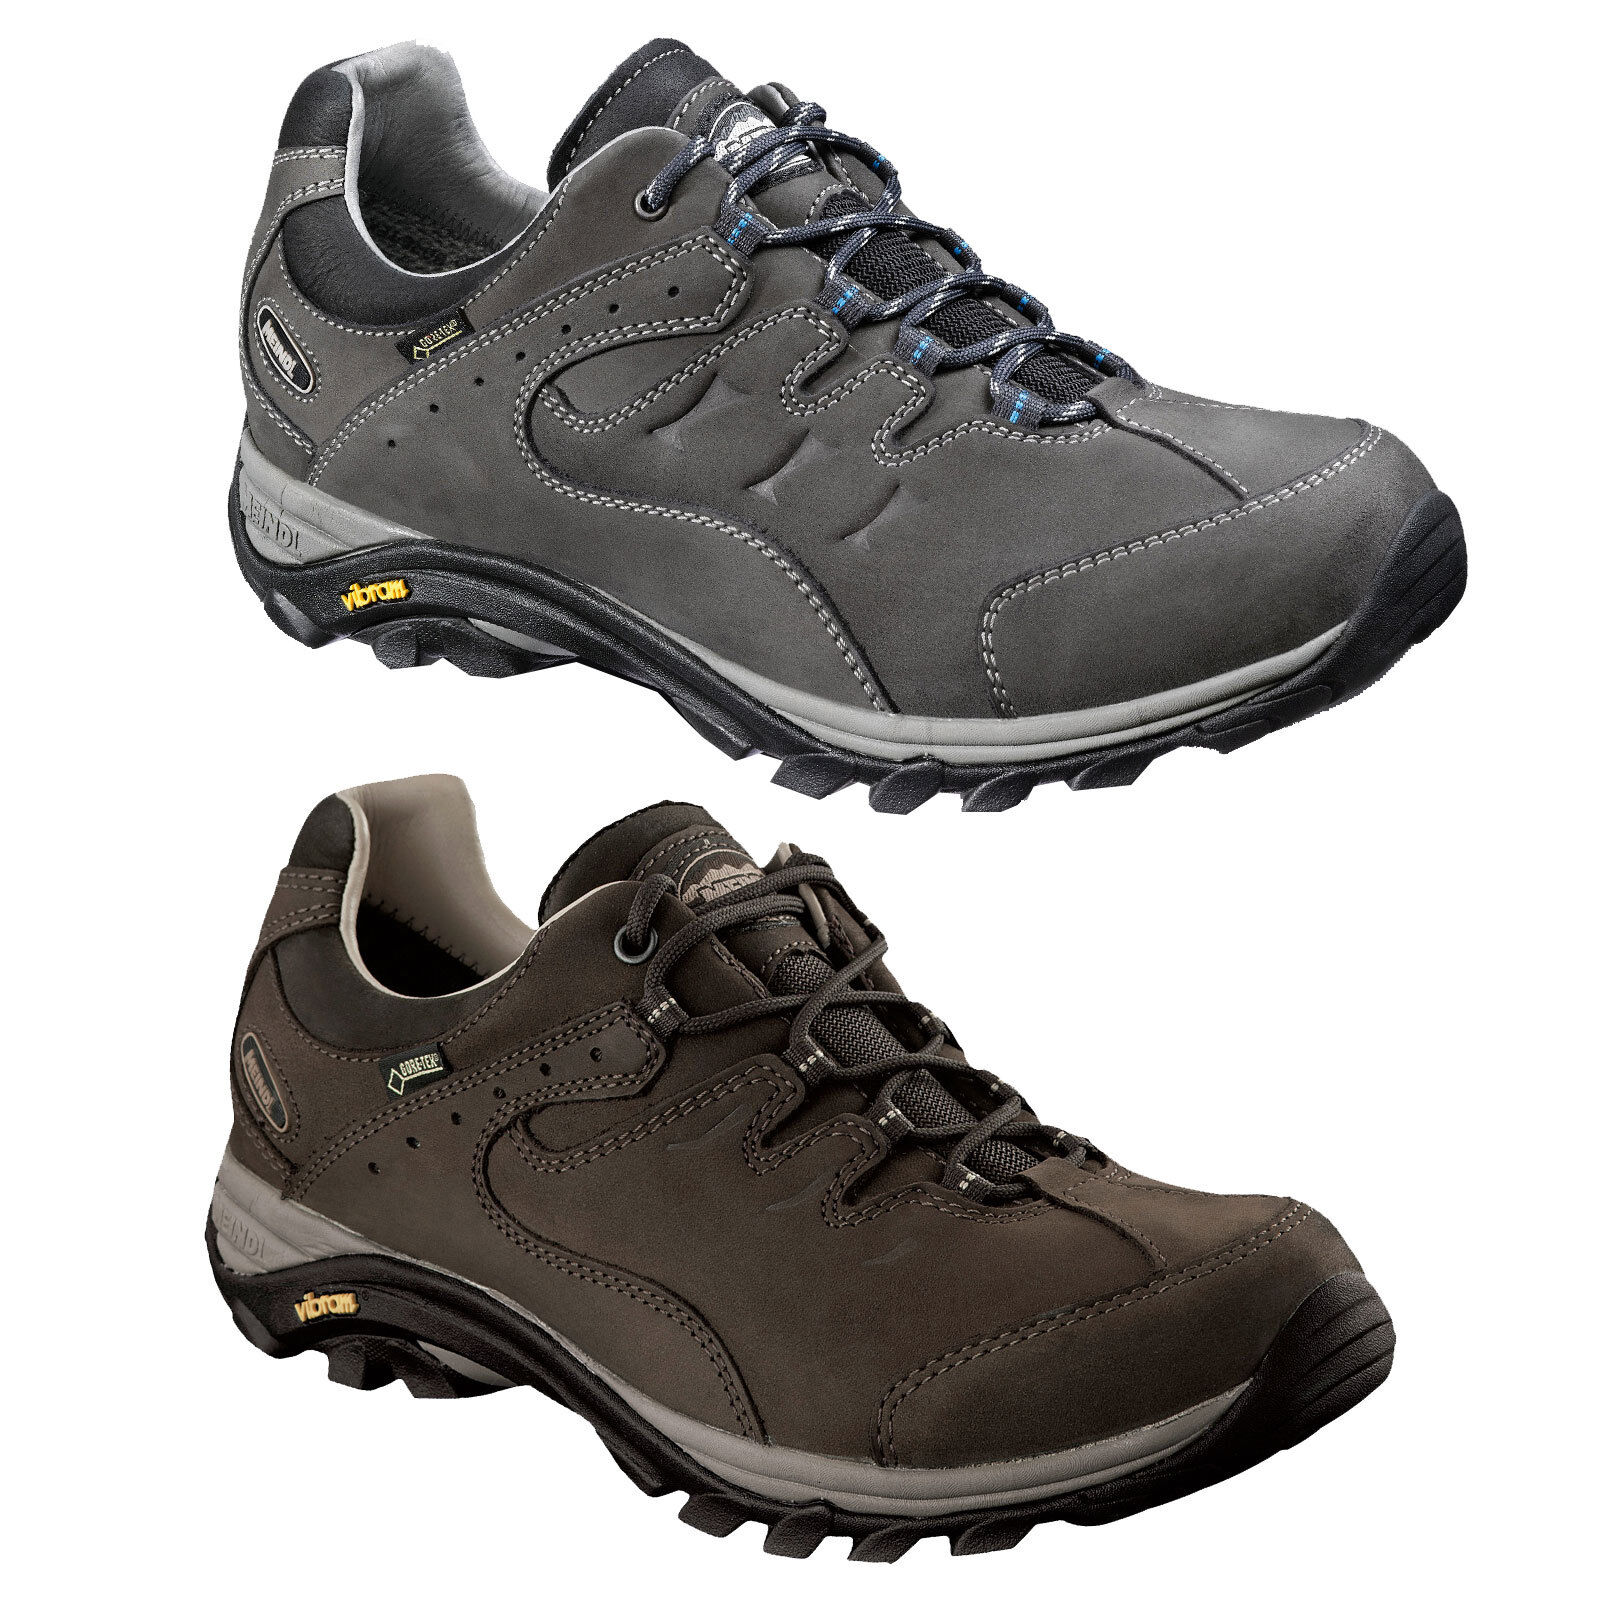 Meindl Caracas GTX botas de Senderismo para Hombres Goretex Impermeable Zapatos